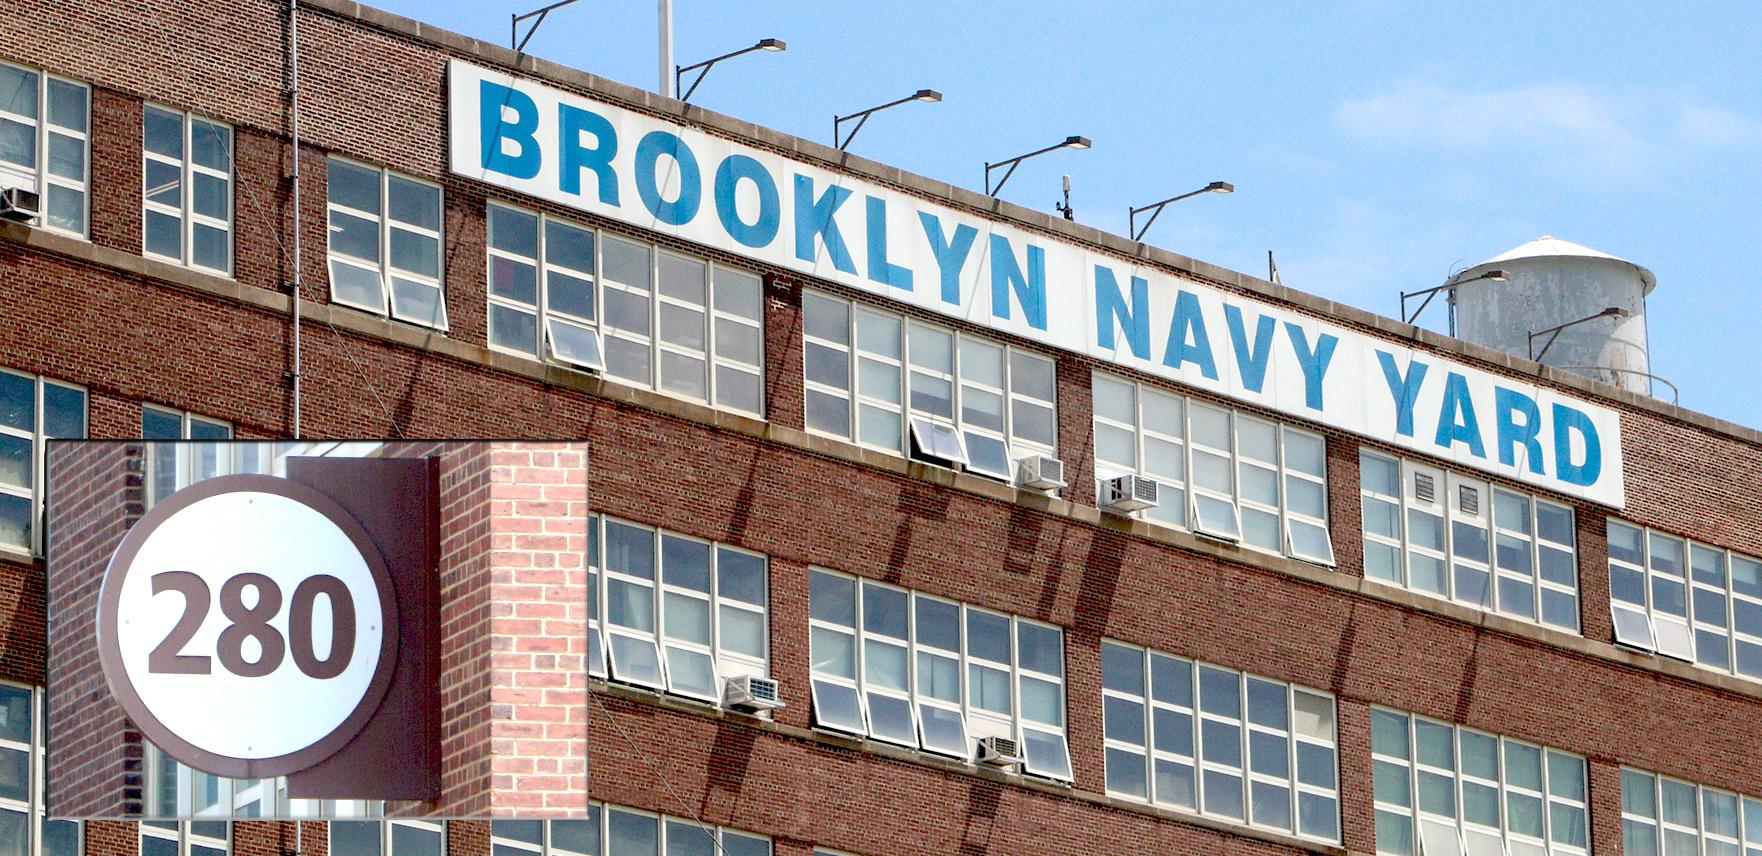 Scott Jordan Brooklyn Navy Yard Building 280